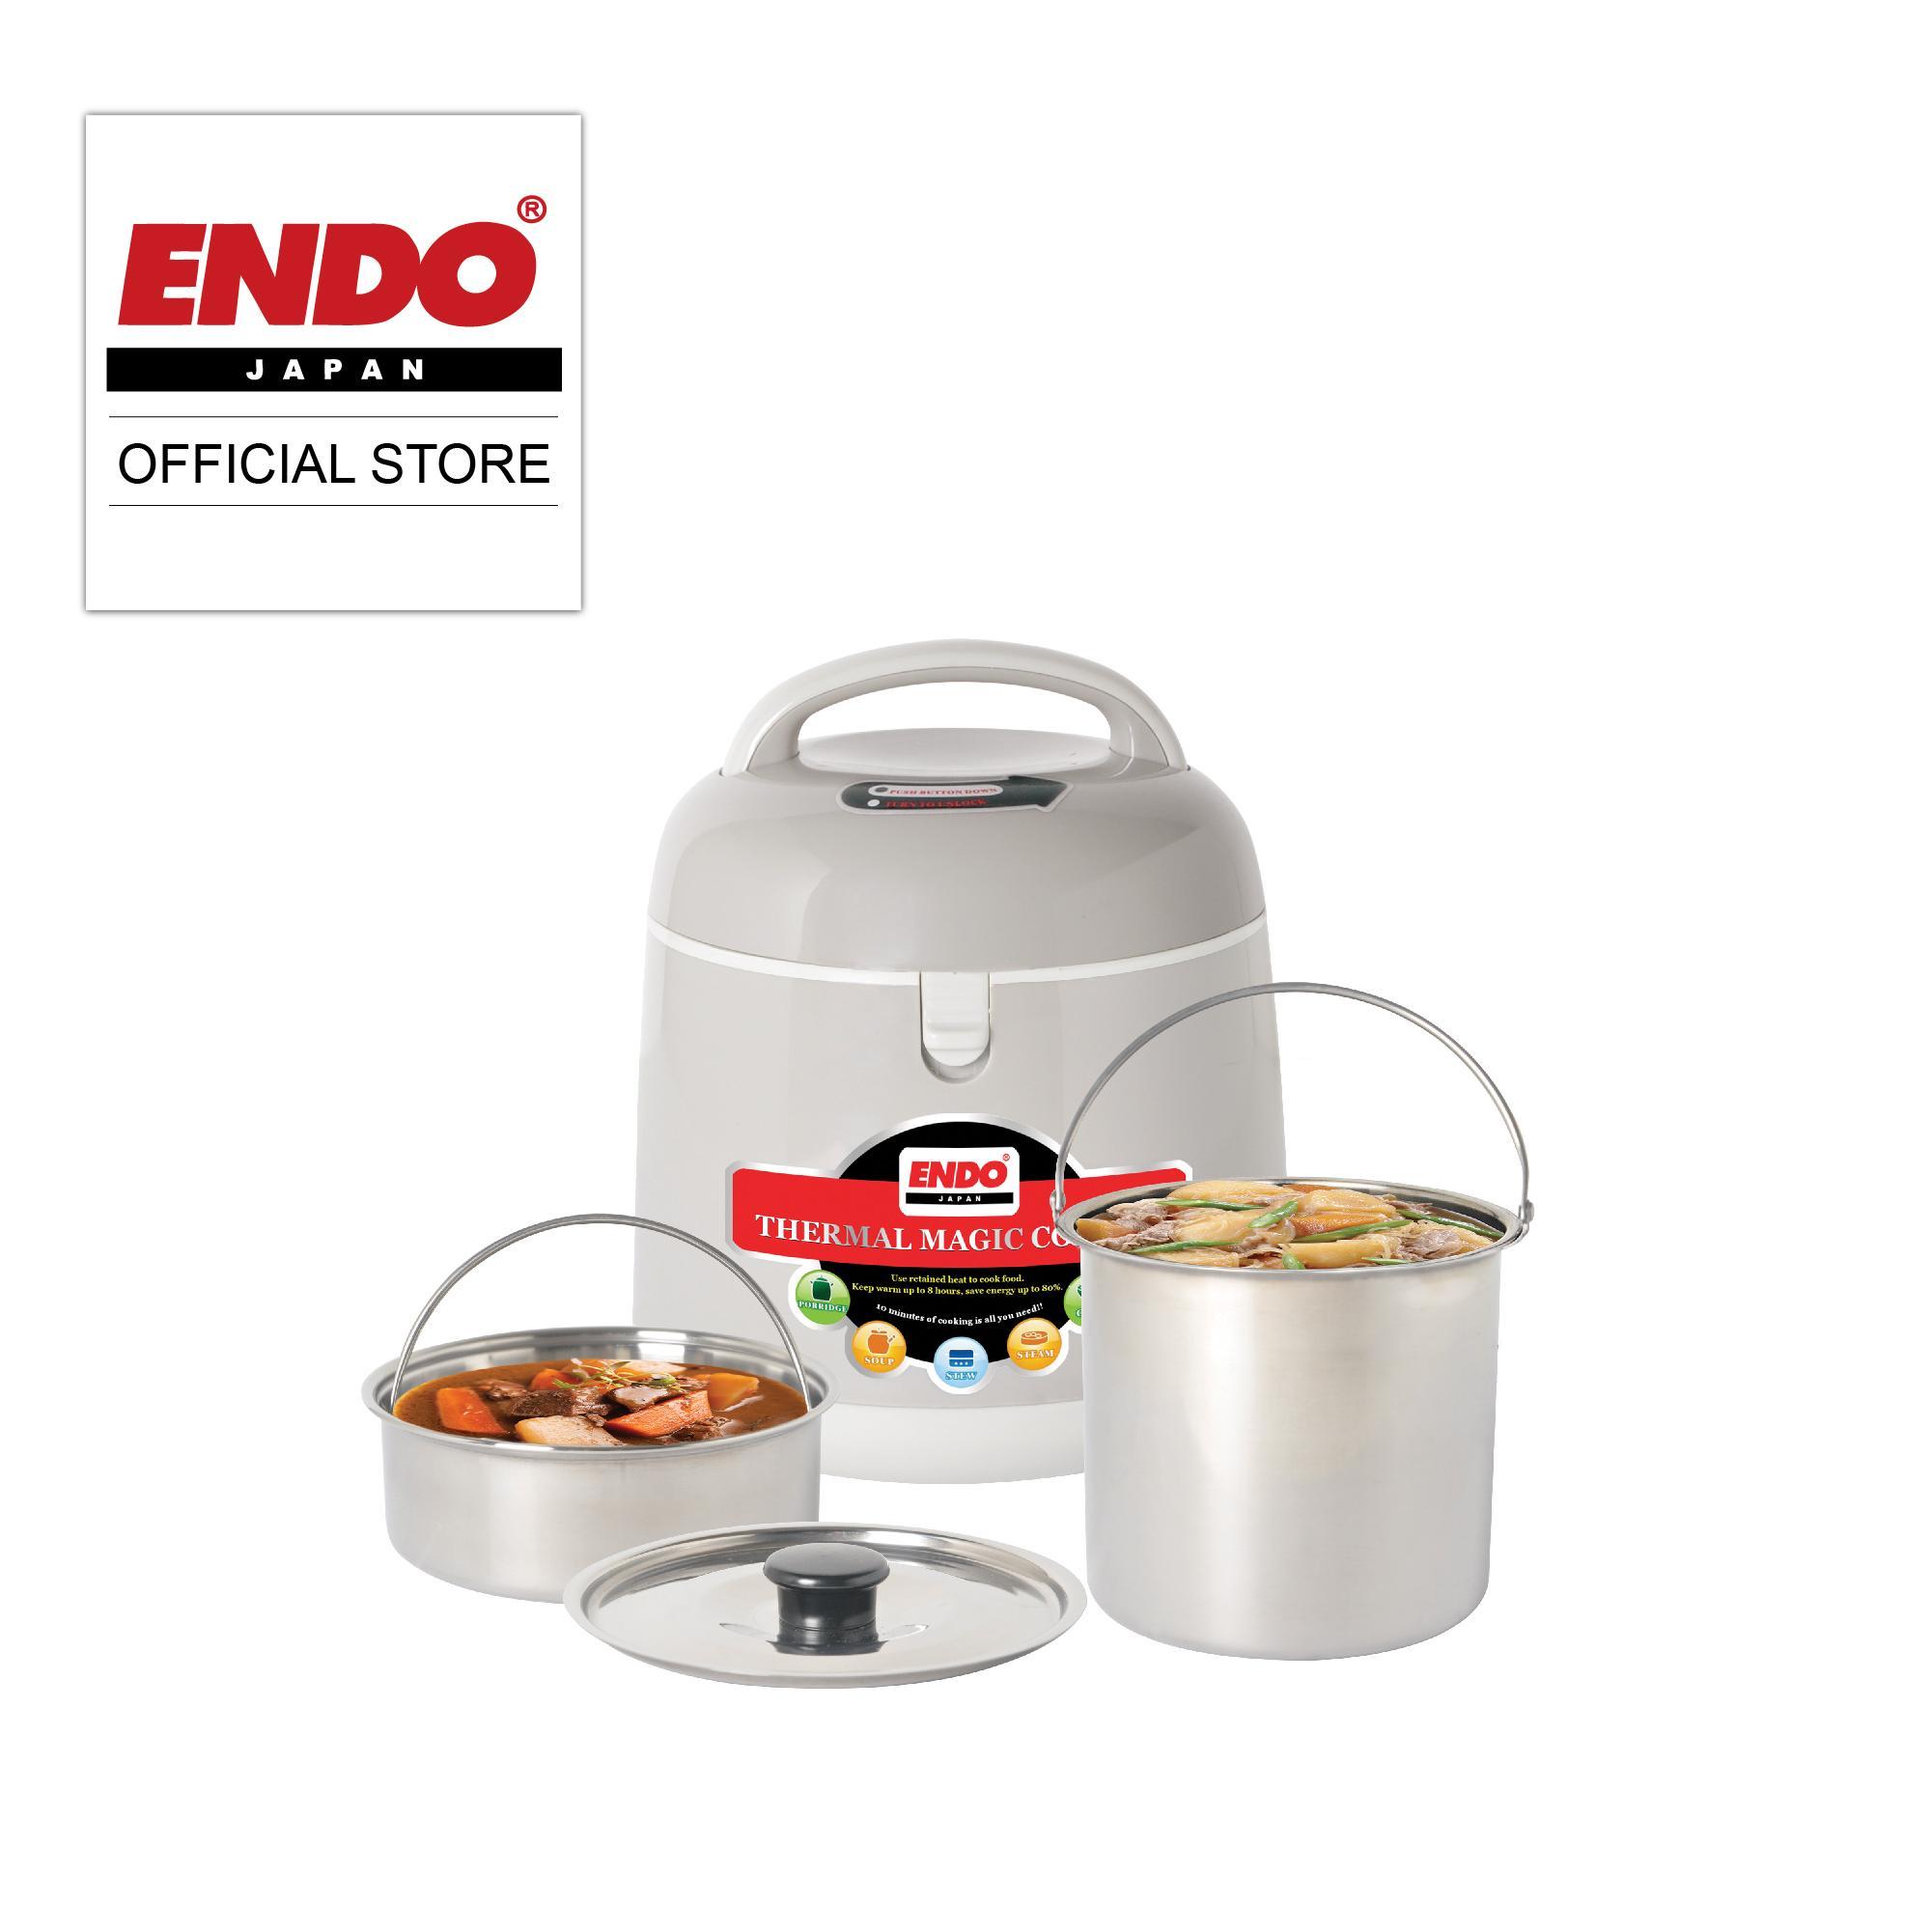 Endo 2.5l Thermal Magic Cooker - E-Tmc2.5 By Heap Seng Group.